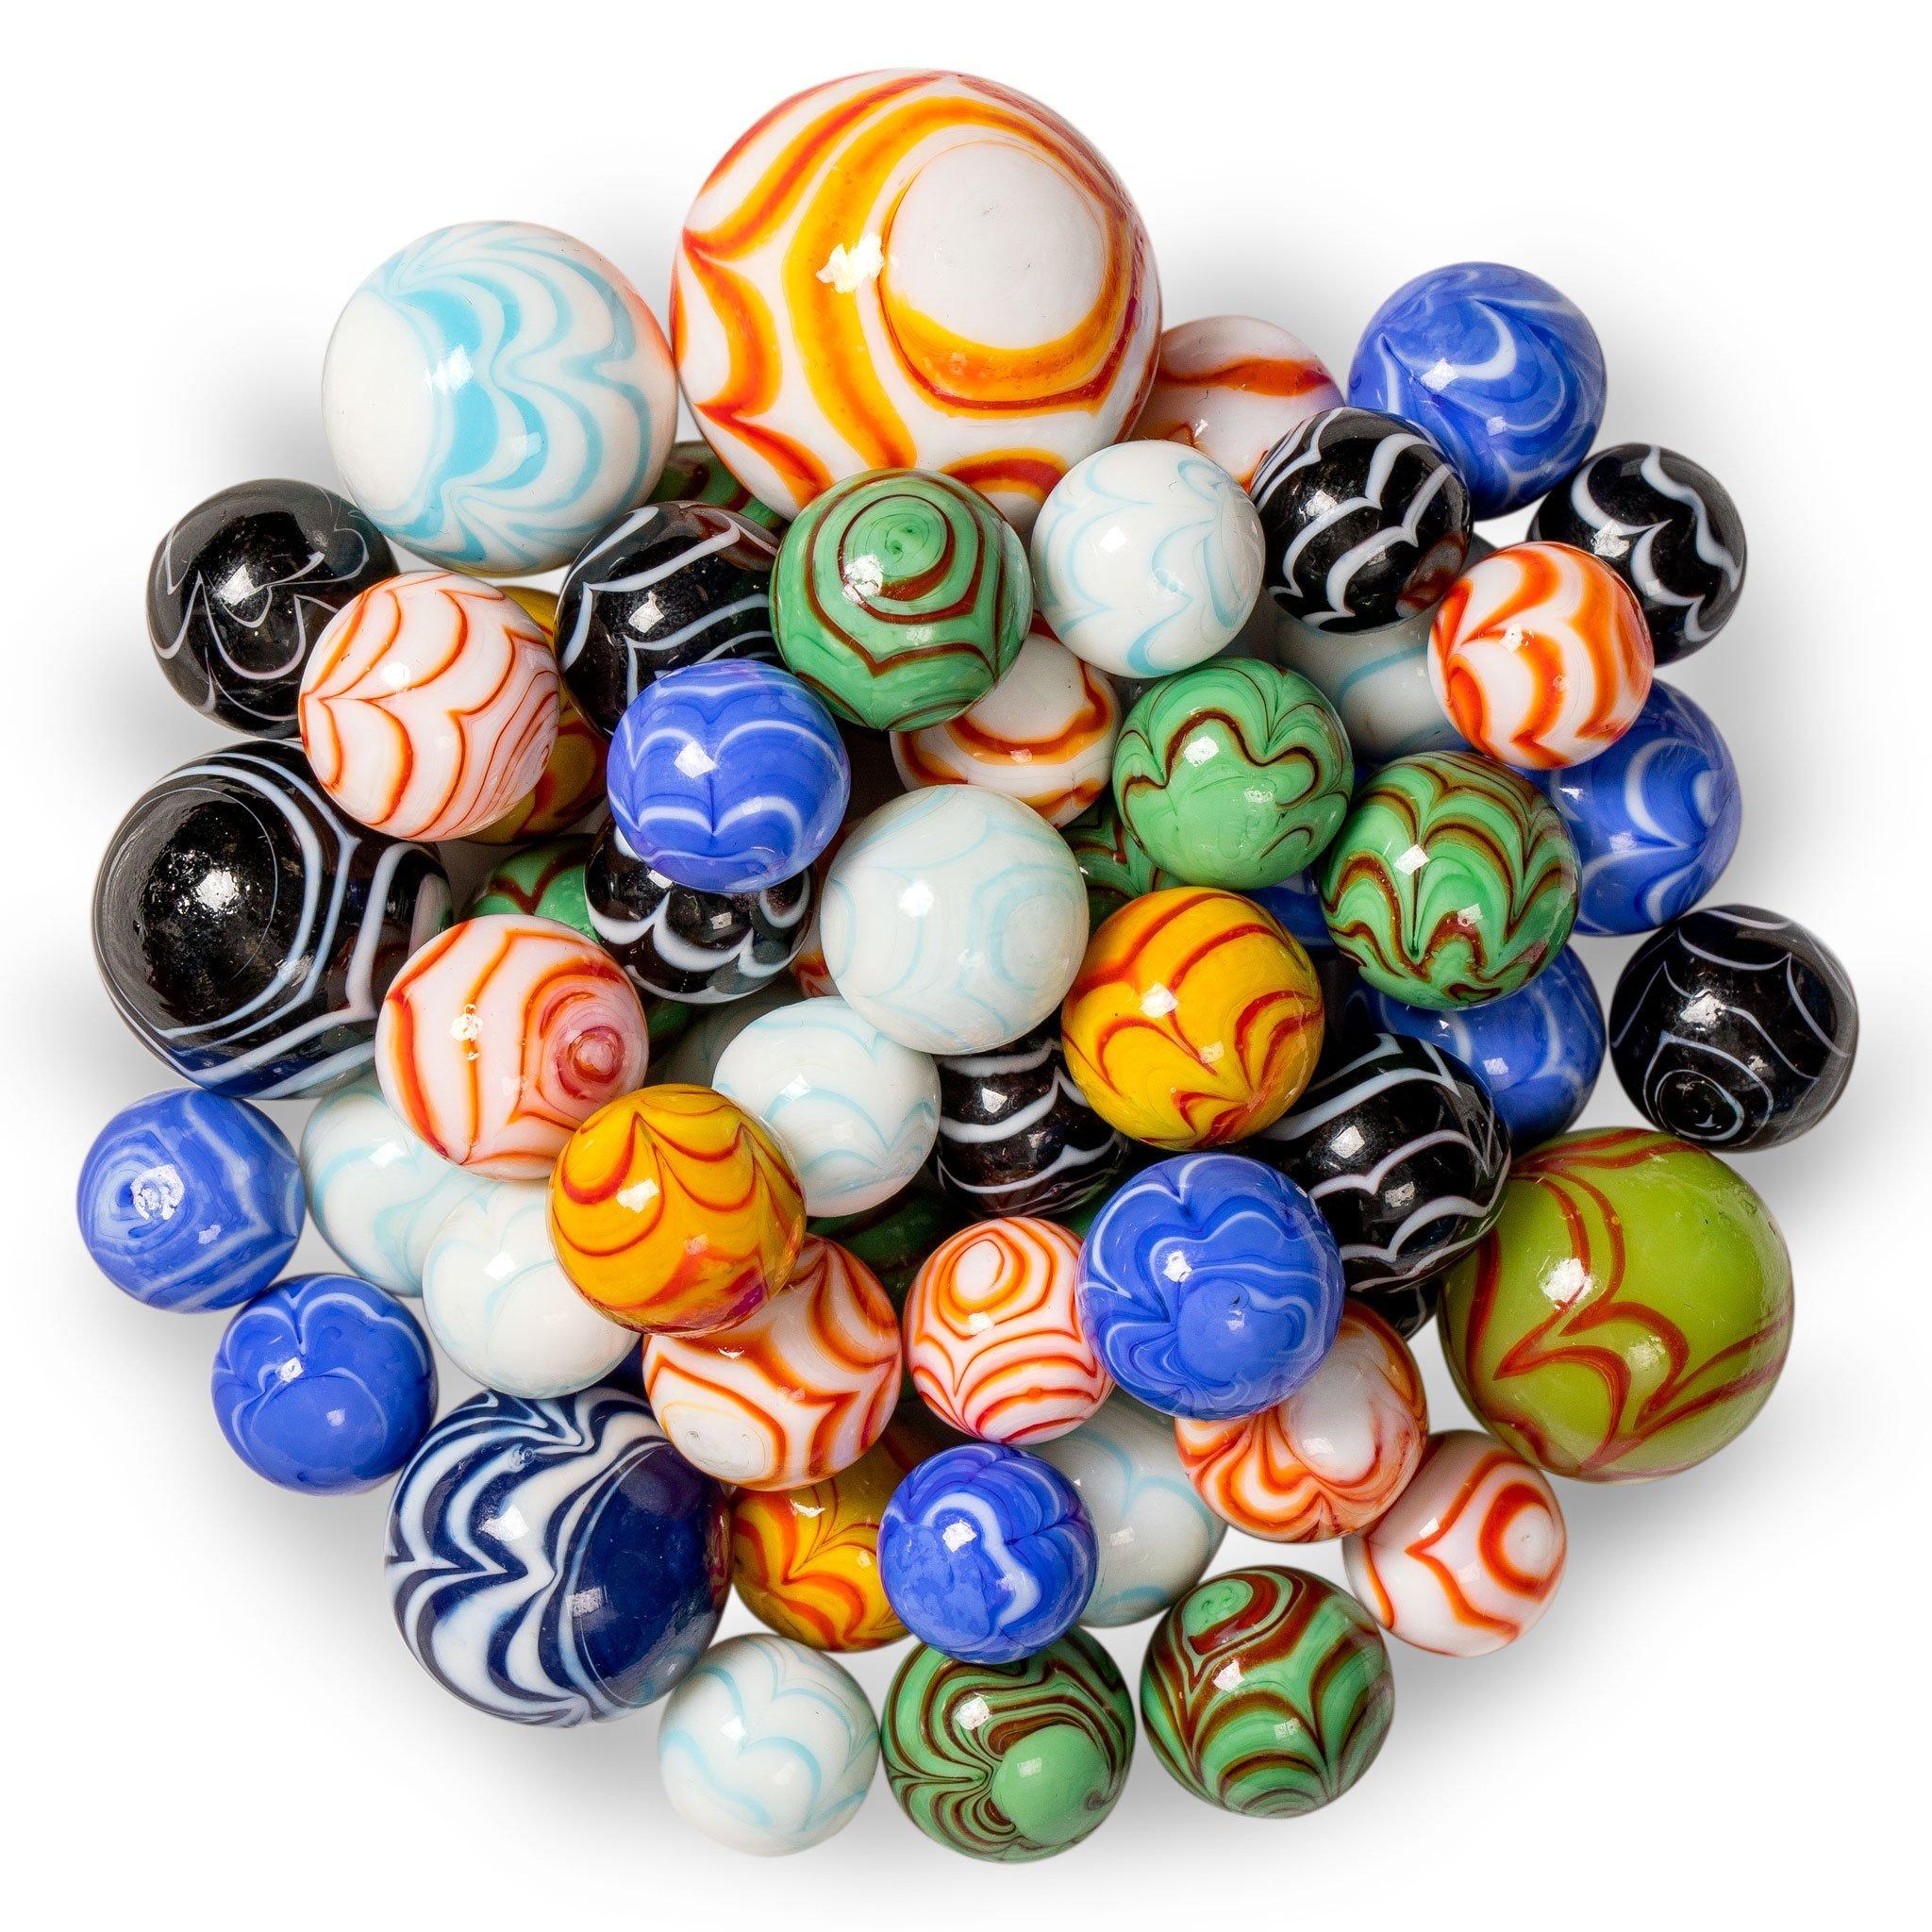 Lava Rocks marbles